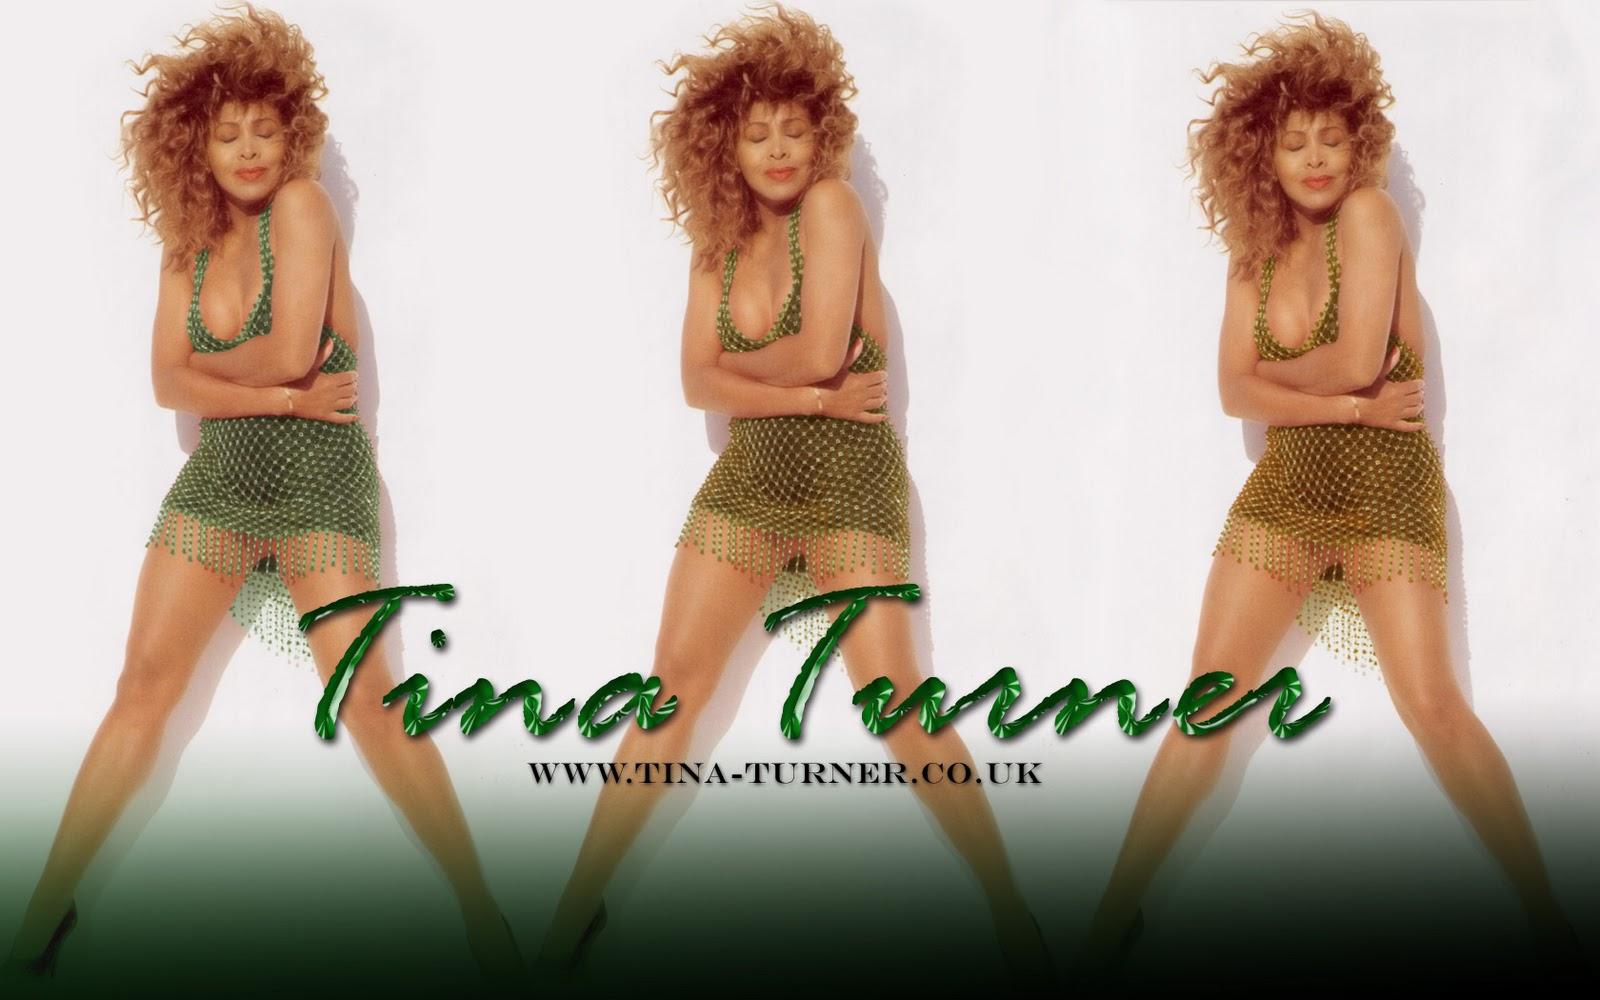 http://2.bp.blogspot.com/_d9TyevPJfT8/TRsNbJ0tK6I/AAAAAAAAD9g/iyDZCwV8yBI/s1600/tina-turner-herb-ritts-images_03.jpg